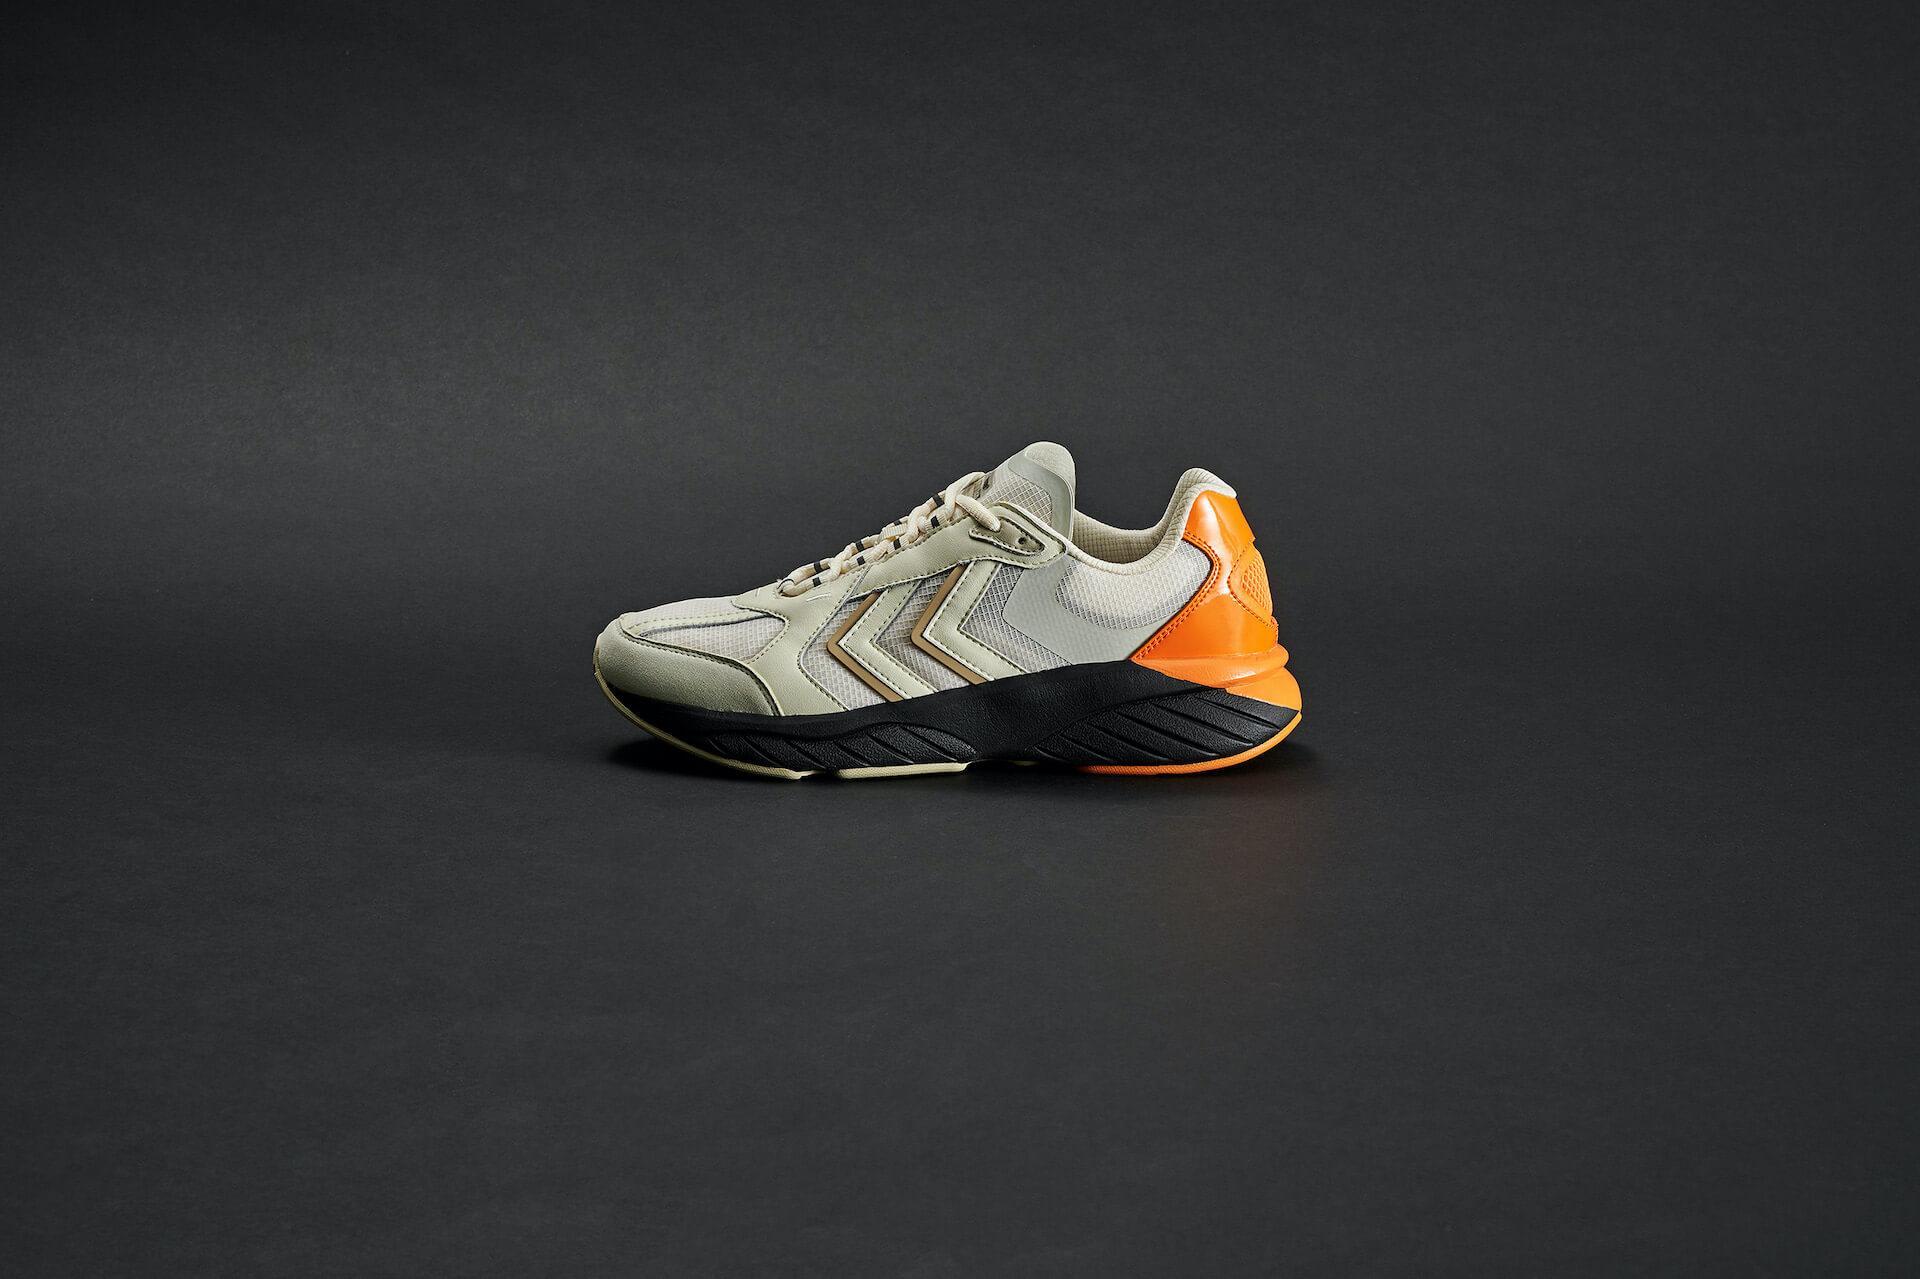 HUMMEL HIVEとASTRID ANDERSENのコラボスニーカーが東京・上野のmita sneakers限定で発売! lf200819_hummelhive_astritandersen_10